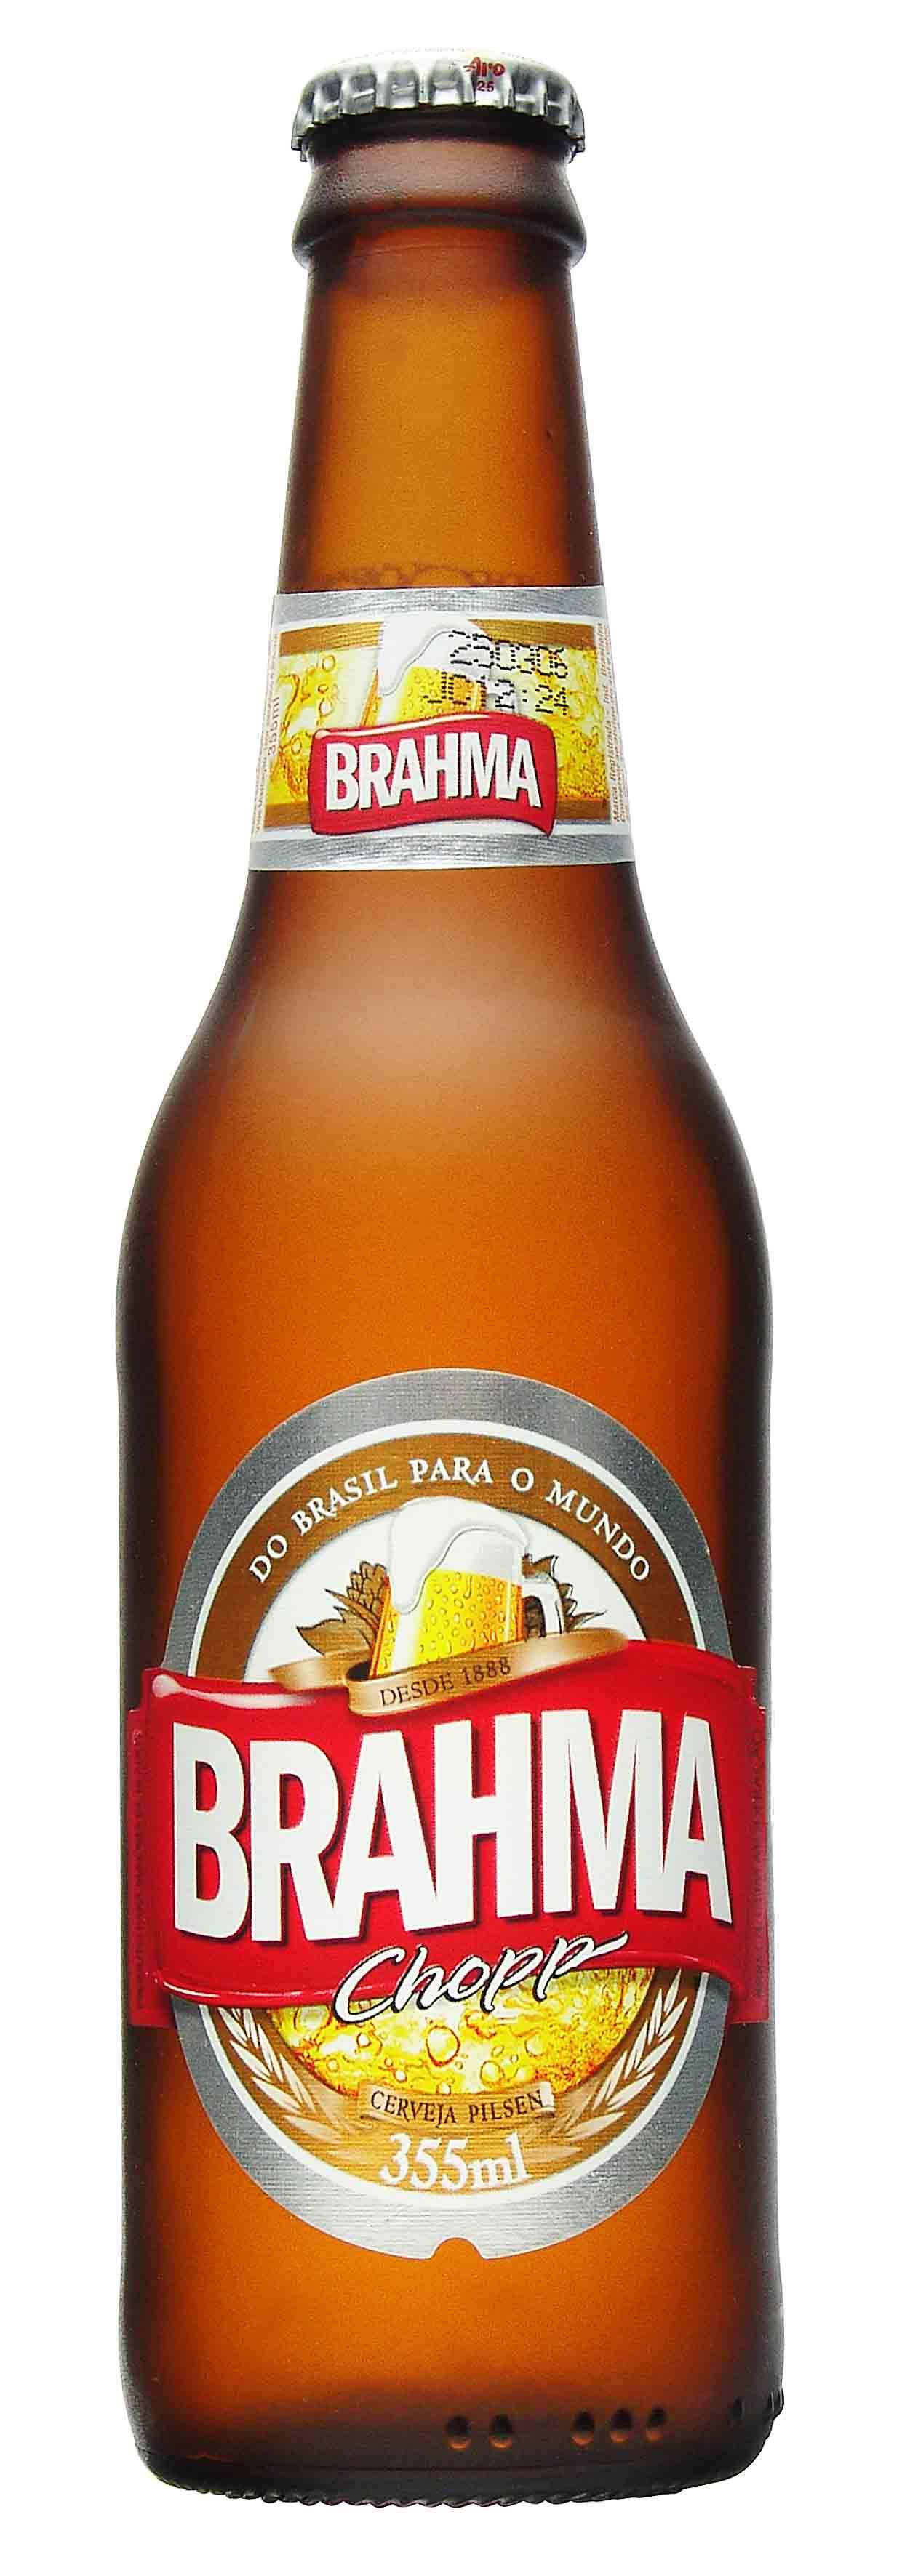 La cerveza Corona ya no es mexicana